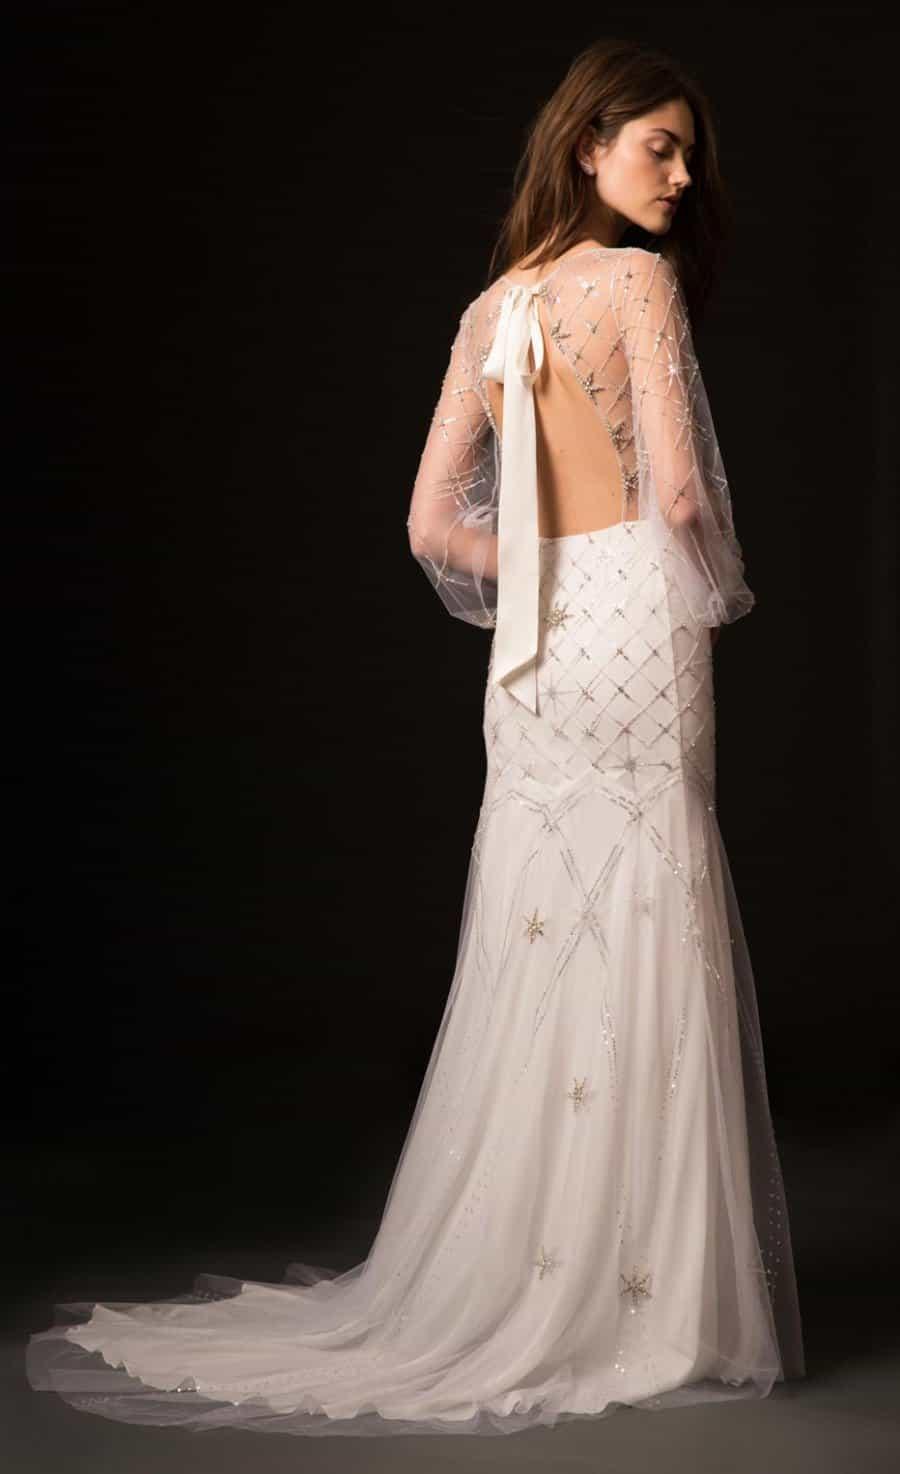 Wedding dress collection: Temperley London Fall 2019